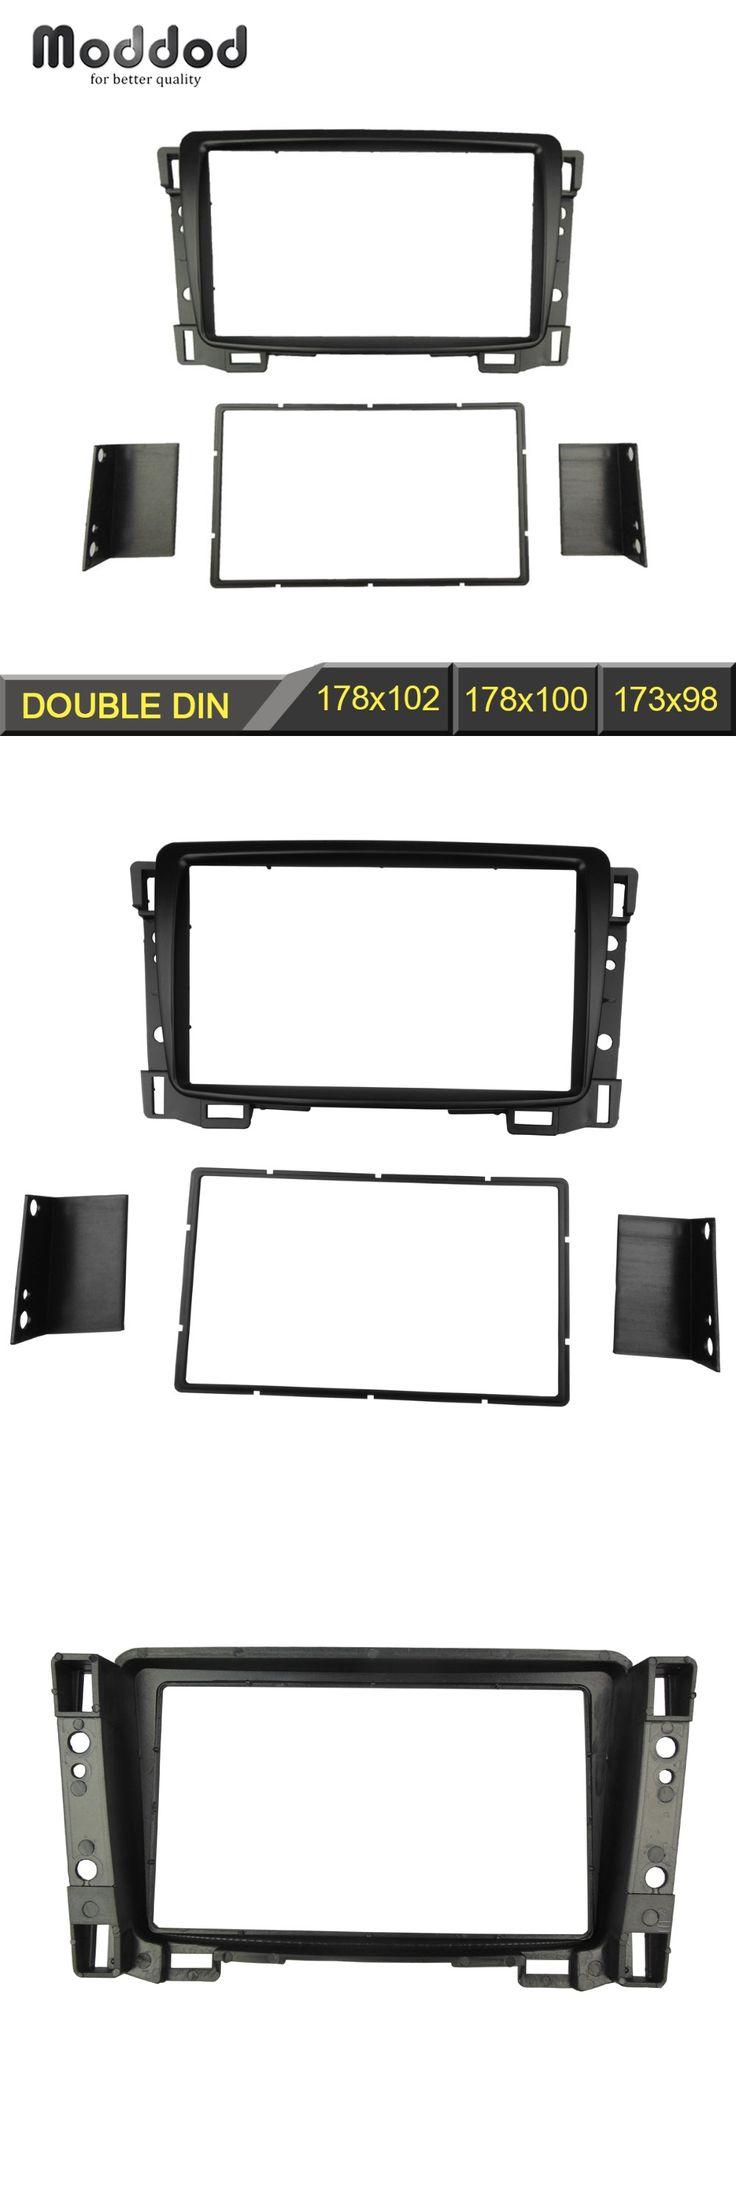 Radio Fascia for Chevrolet Sail Double 2 Din DVD Stereo Panel Dash Mount Install Trim Kit Refit Frame